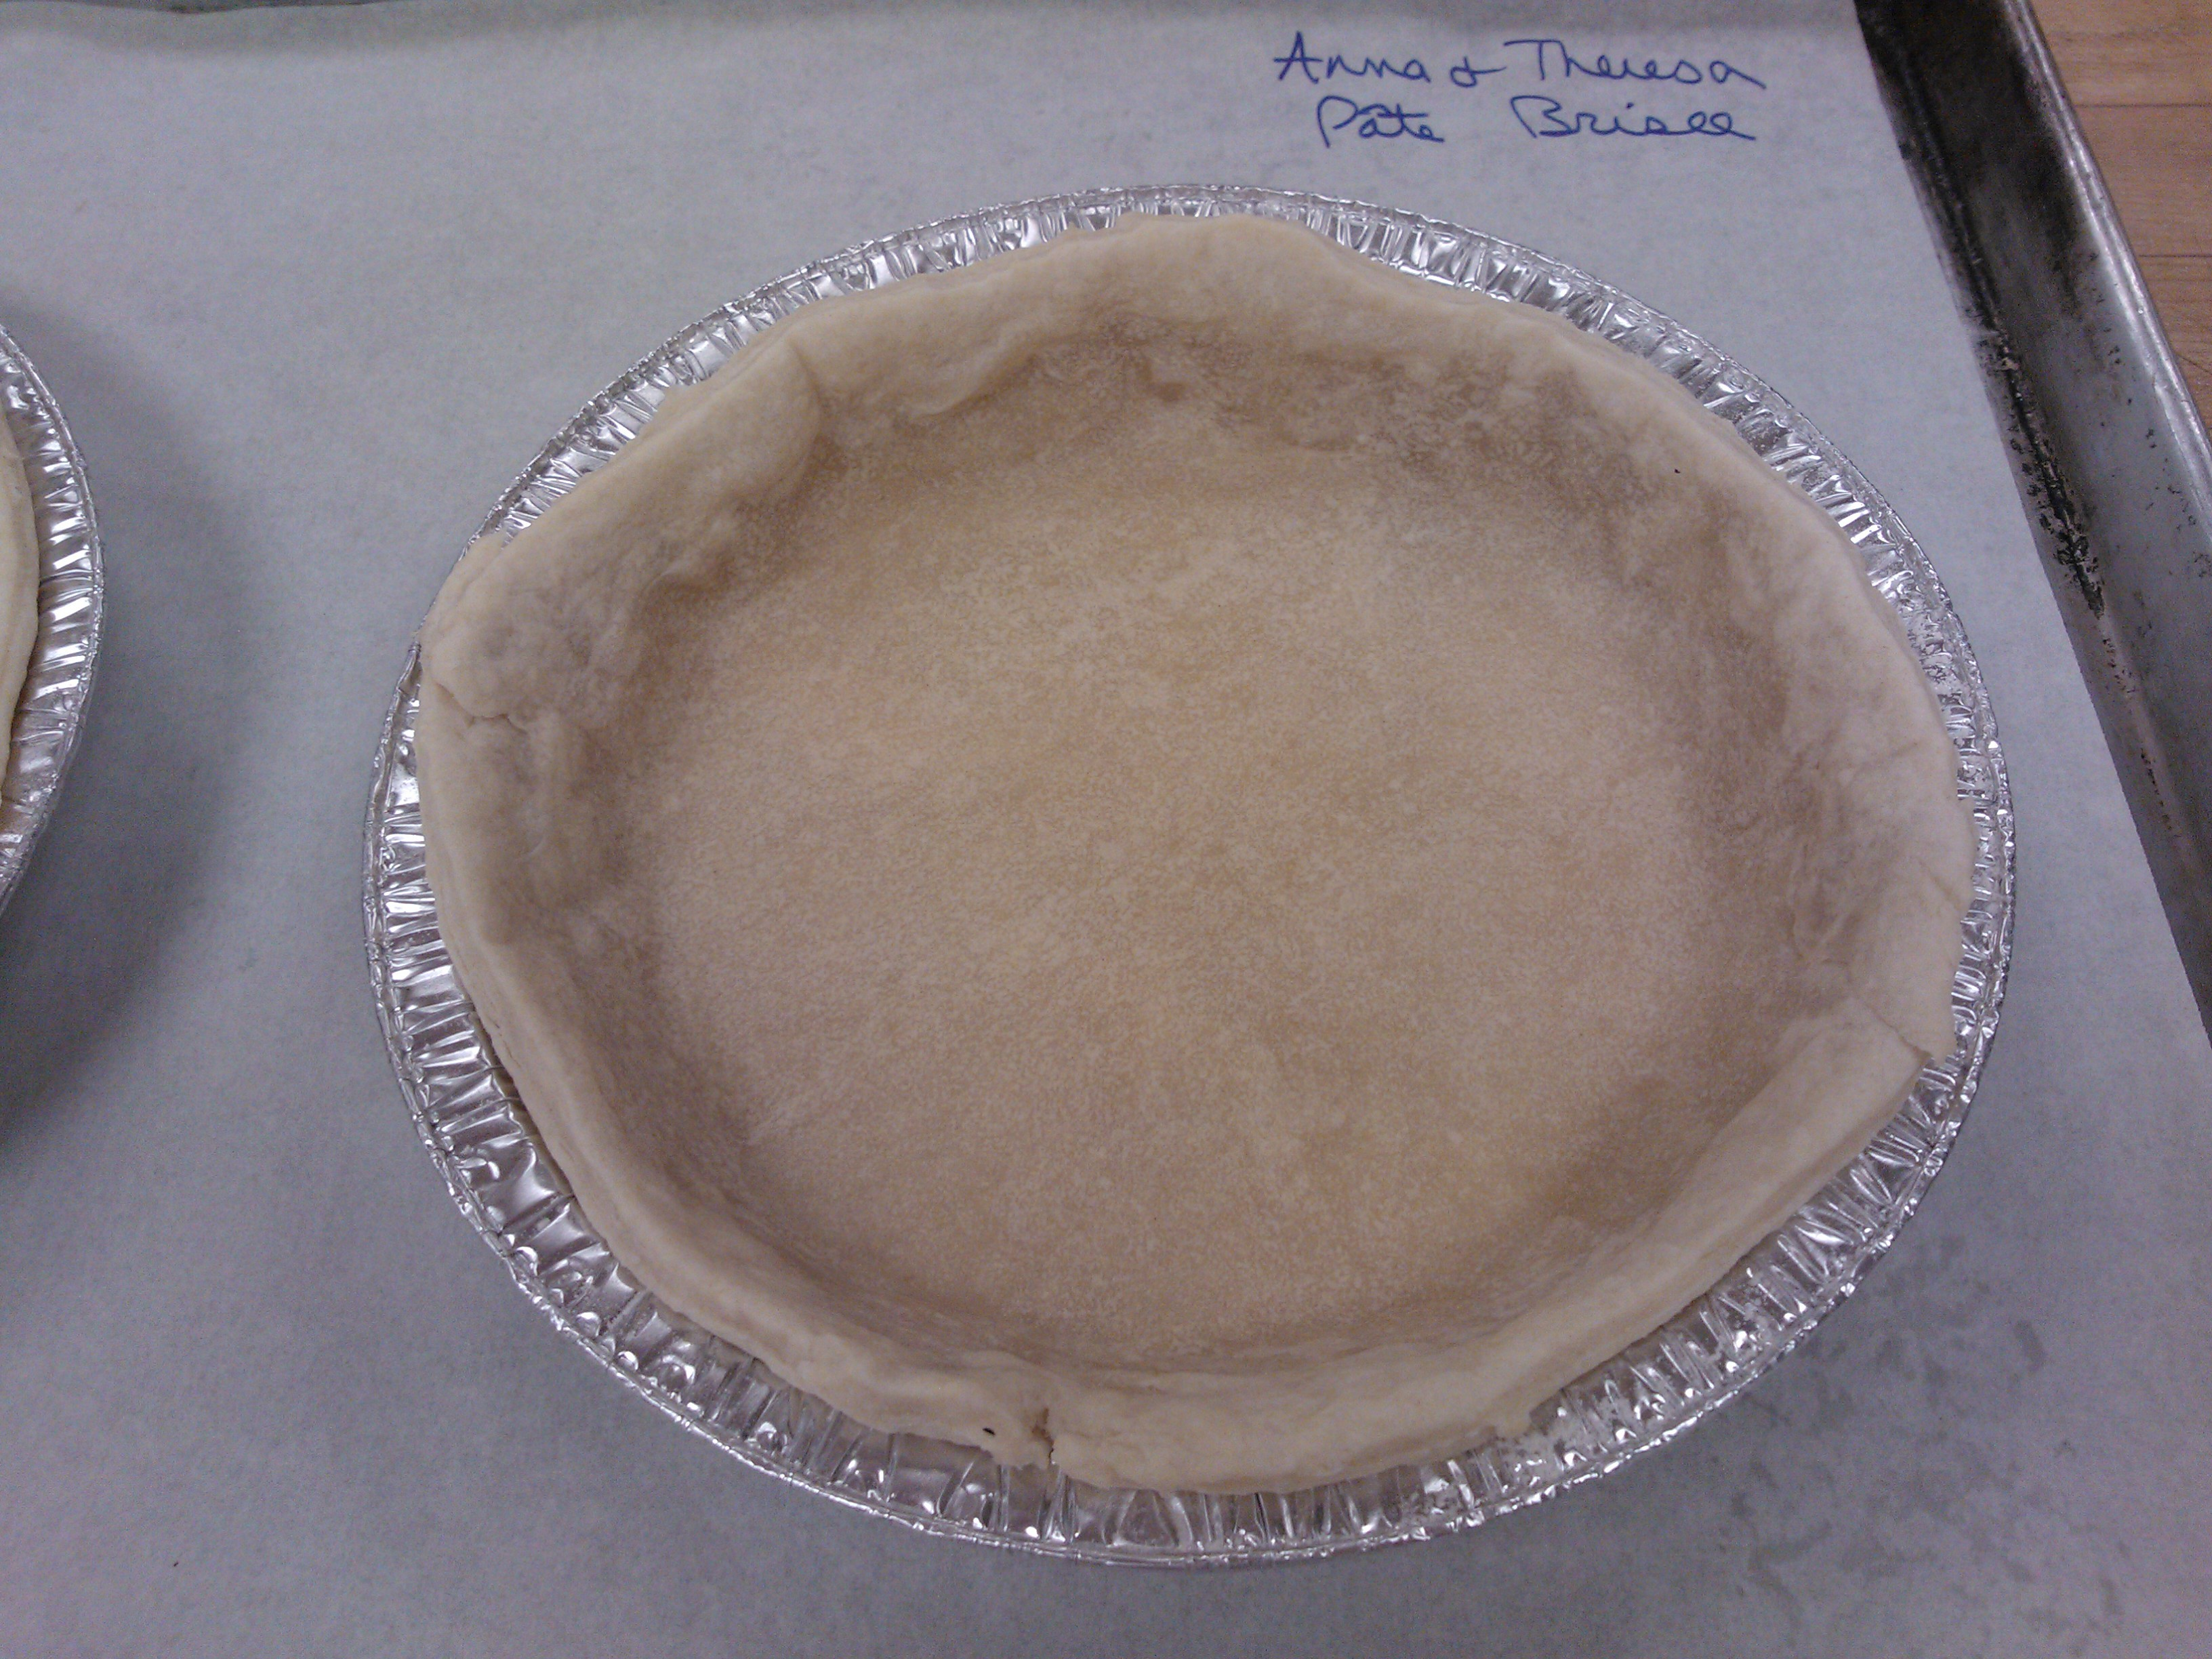 Pie Crust #2: Pate Brisee | Around Anna's Table